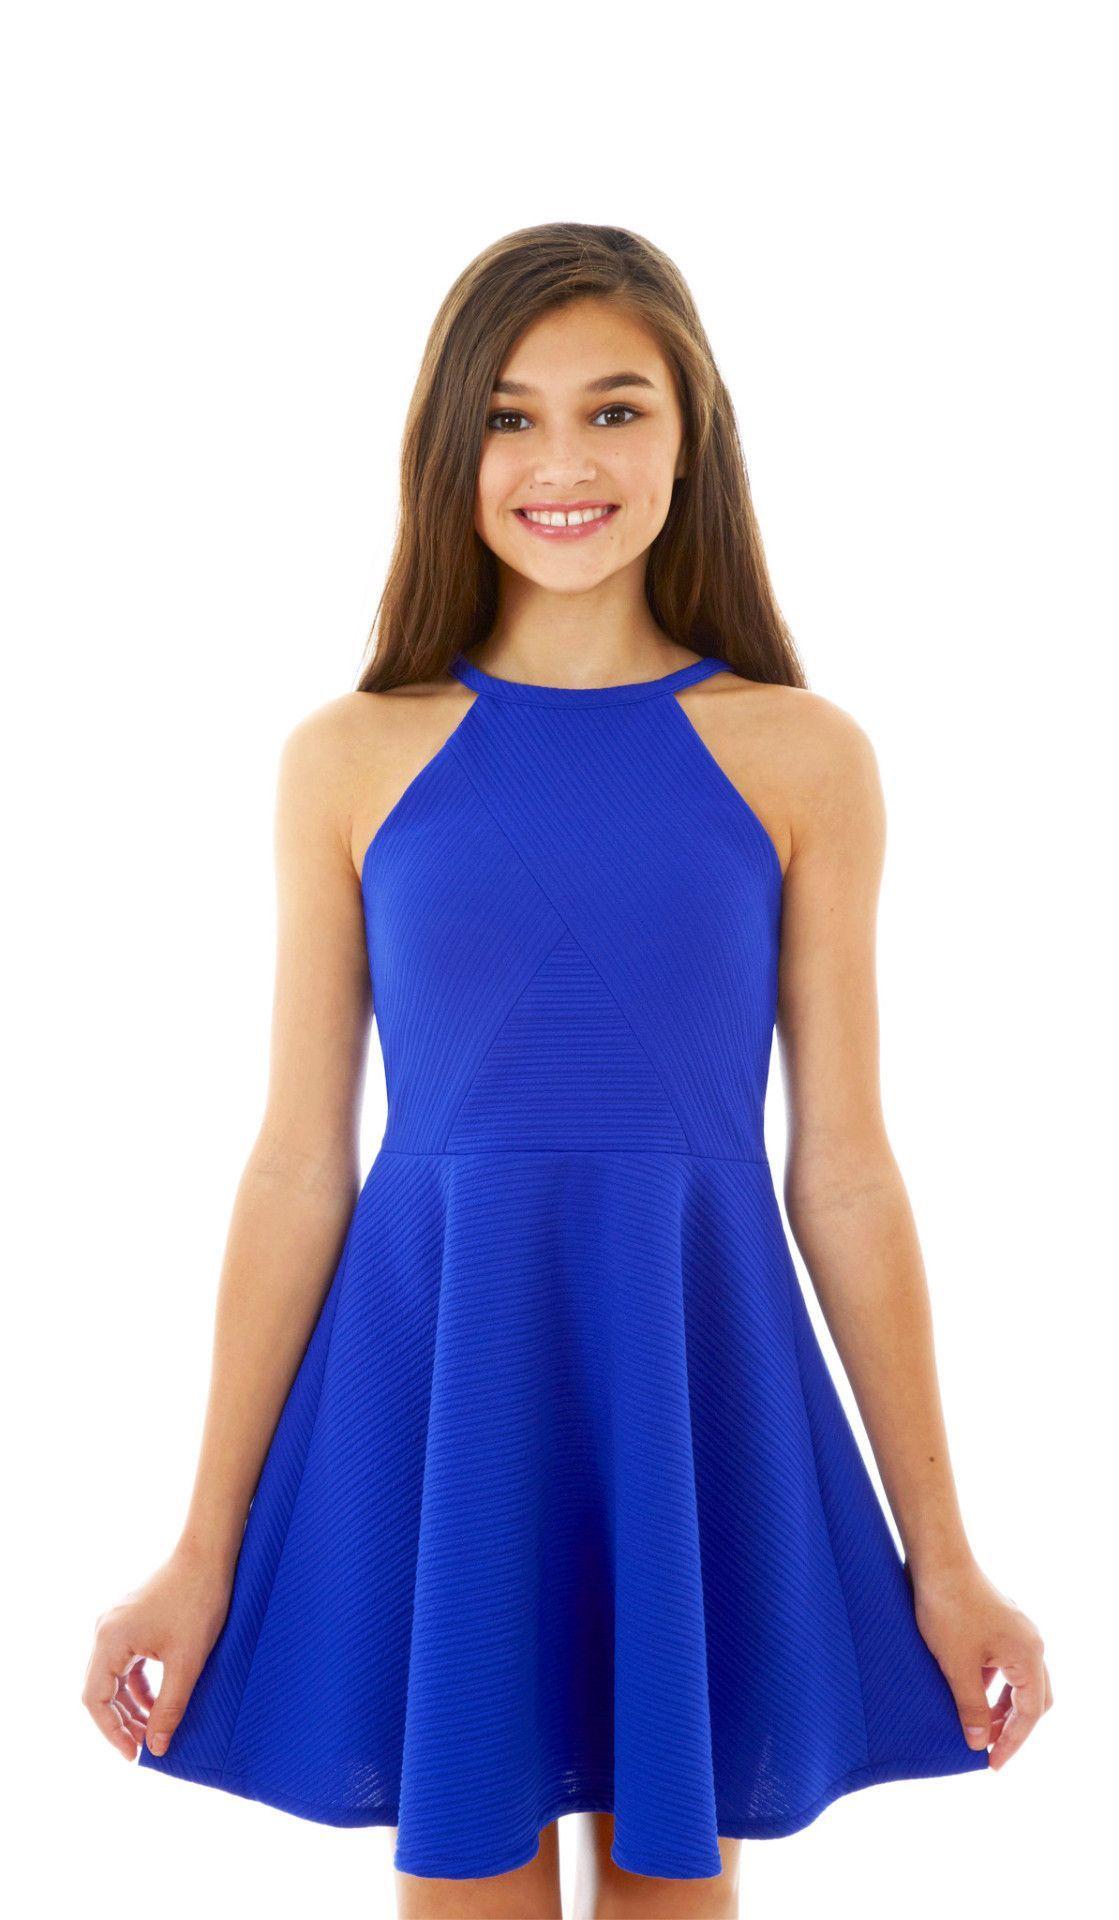 THE EMILY DRESS -8  Dresses for tweens, Girls dresses tween